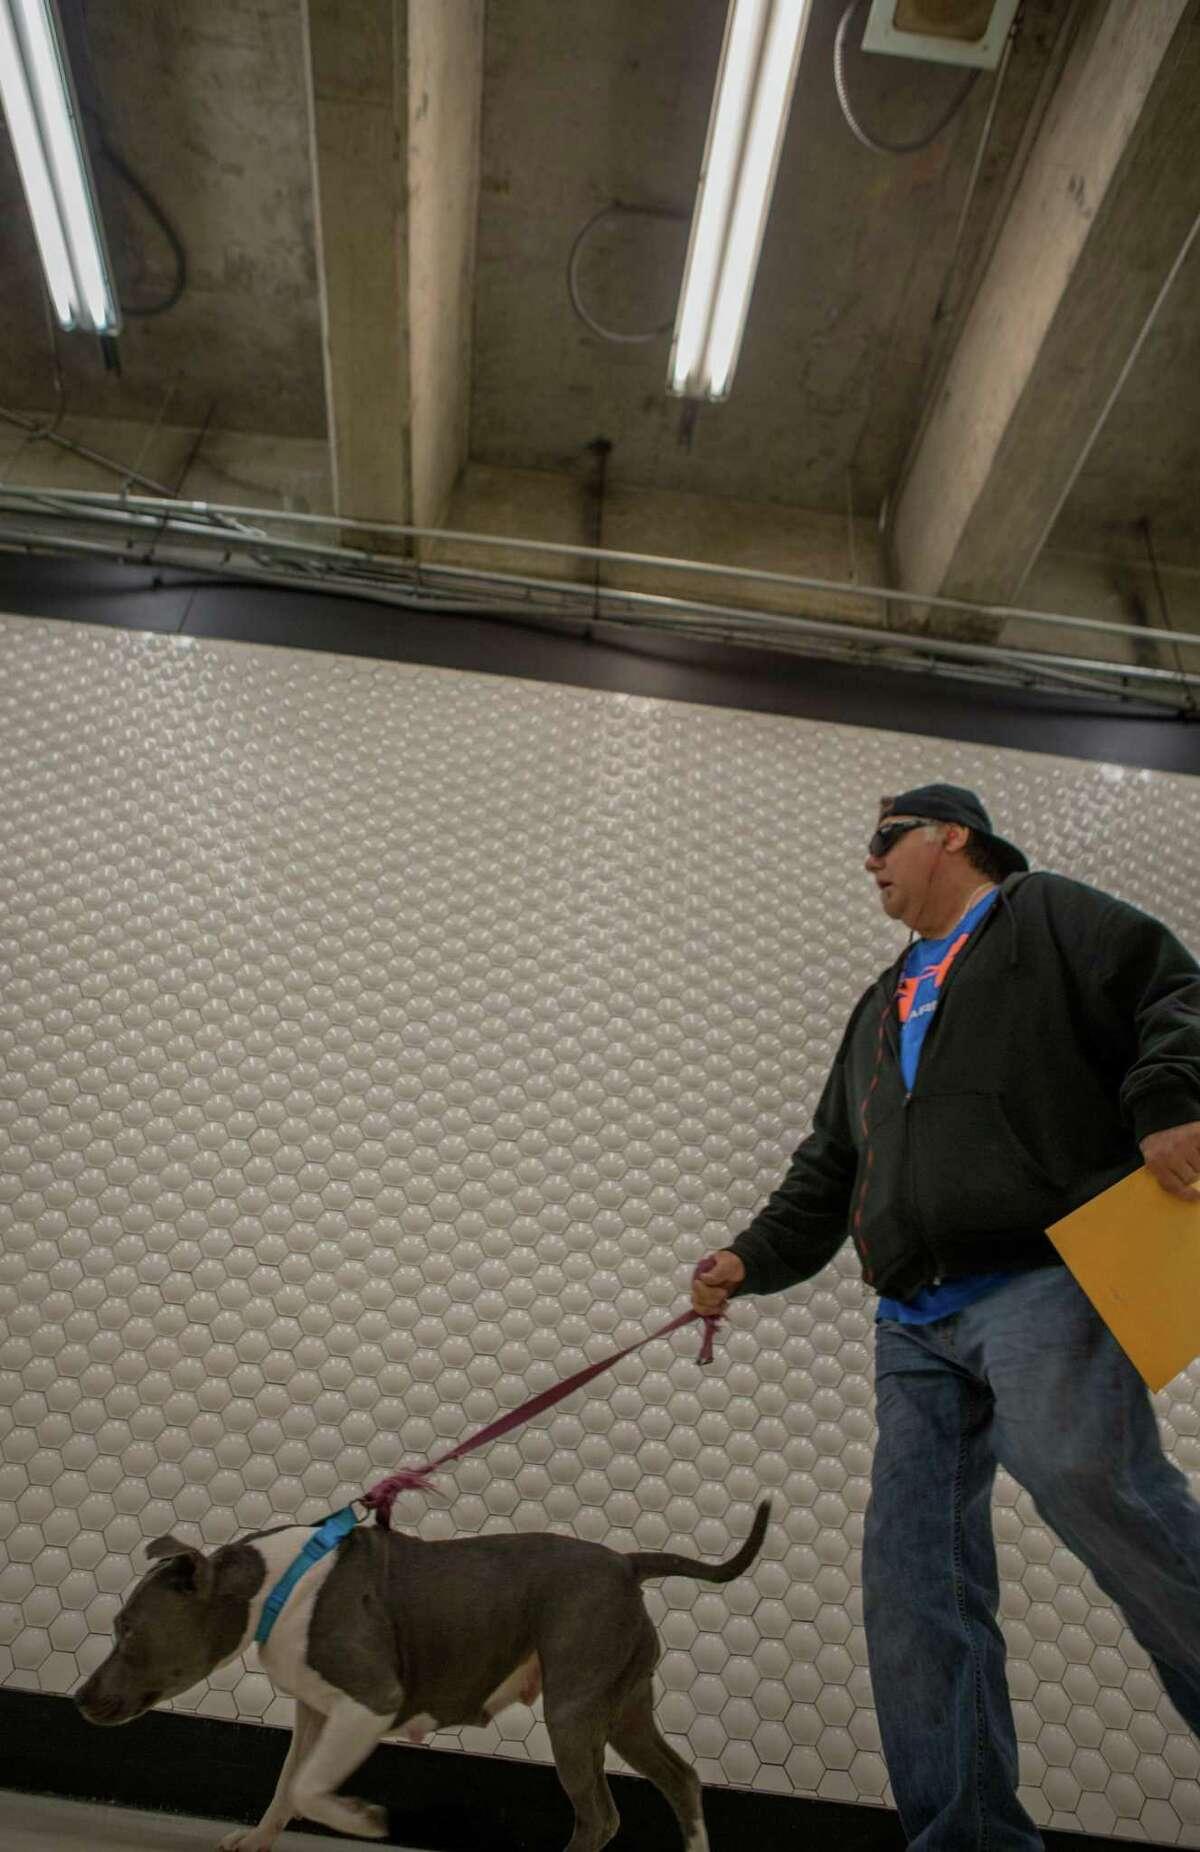 Kenny McKinnon walks his dog, Lola, through BART's Powell station on Friday, Nov. 6, 2015 in San Francisco, Calif.